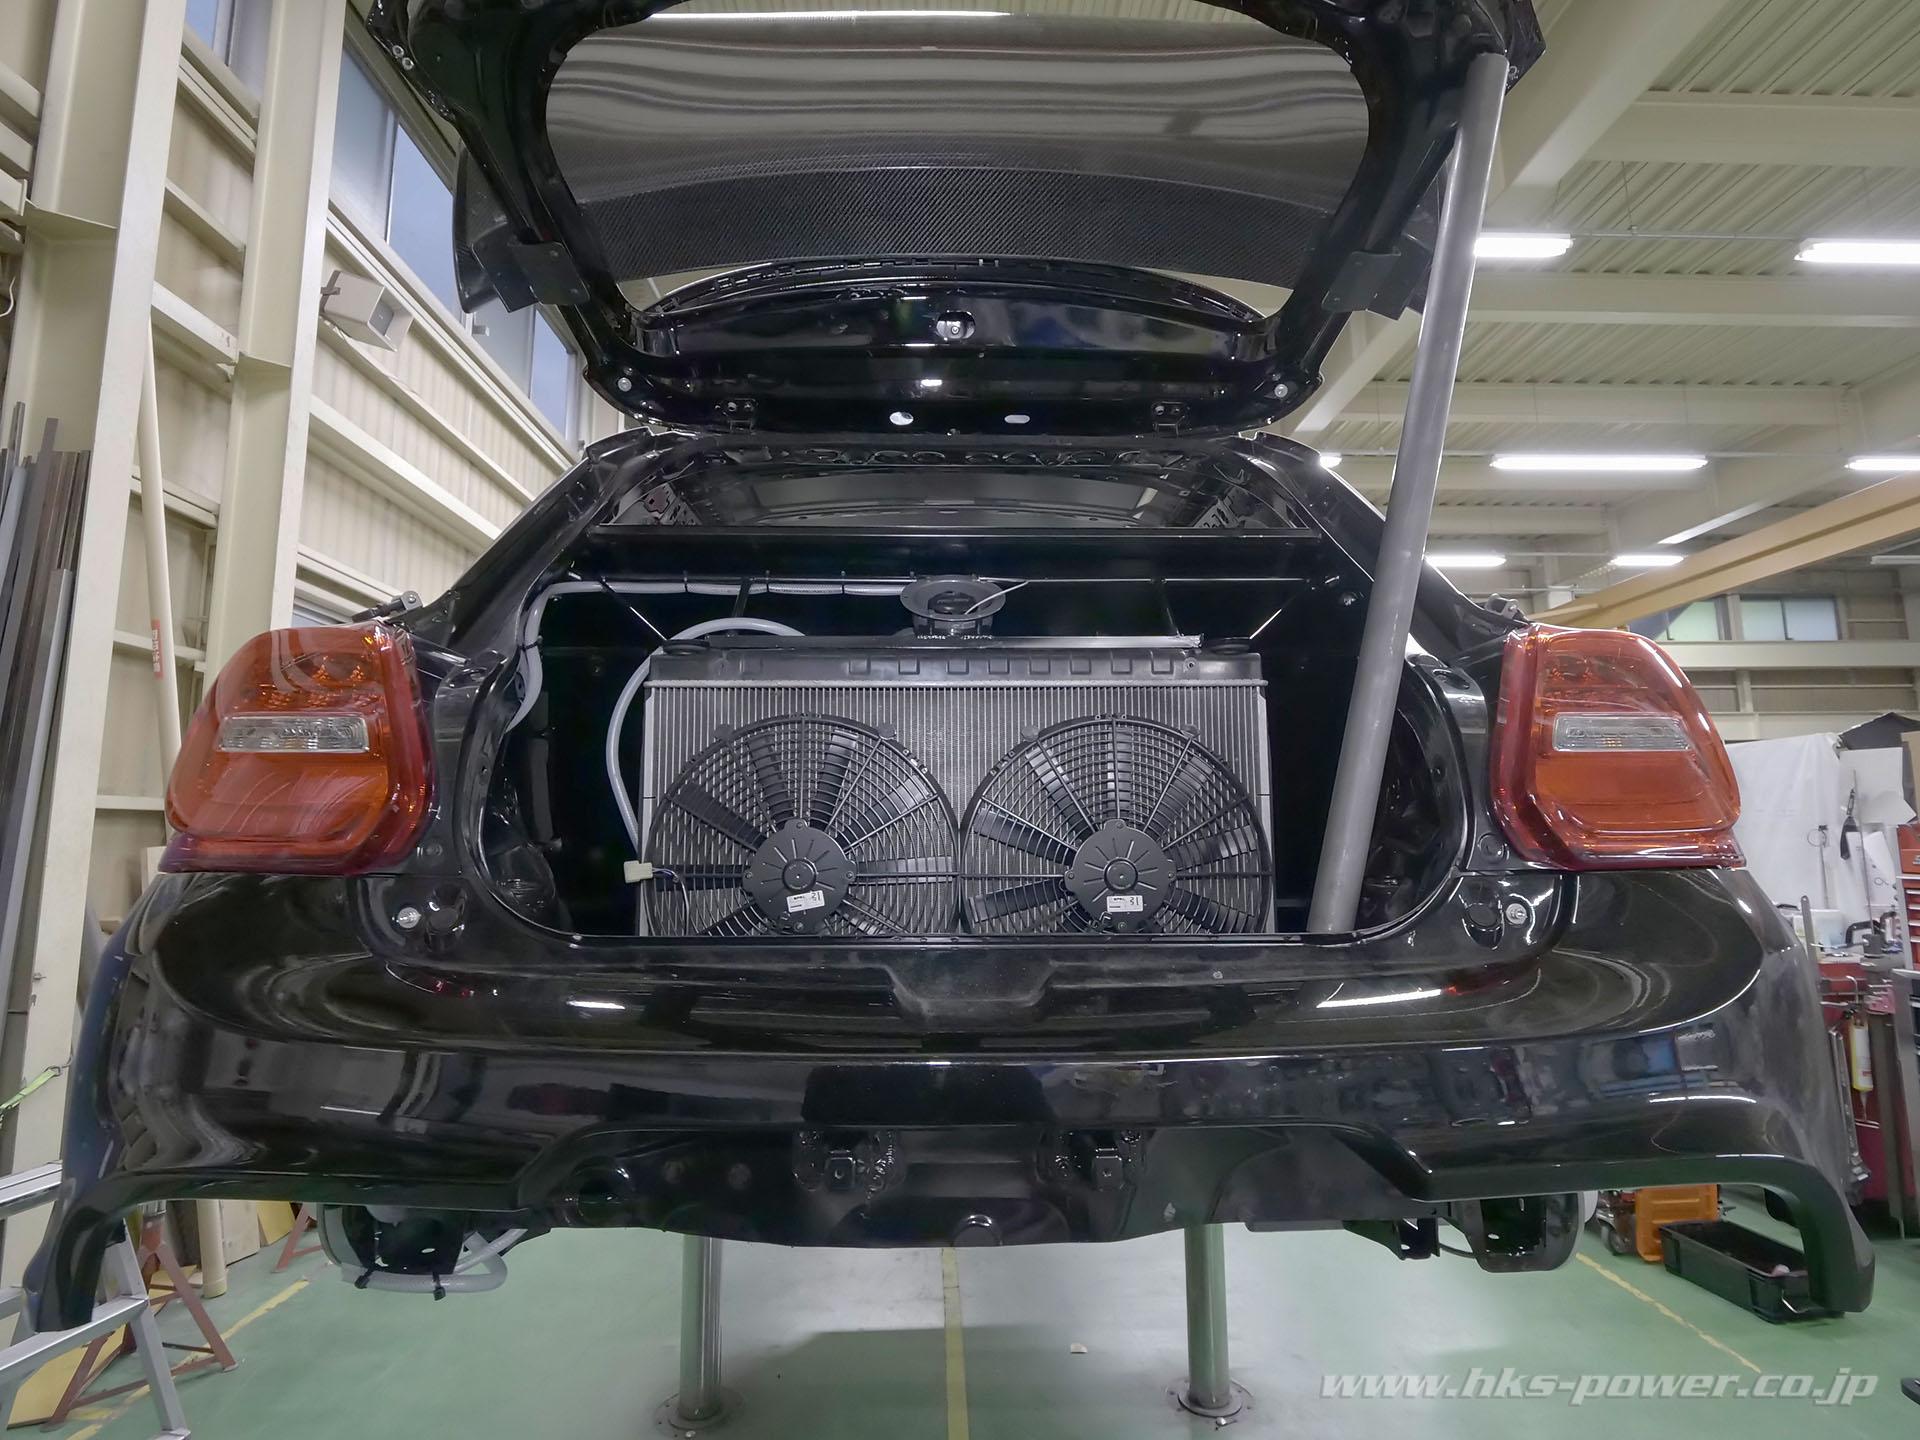 HKS' Suzuki Swift Sport with a 4G63T Inline-Four – Engine